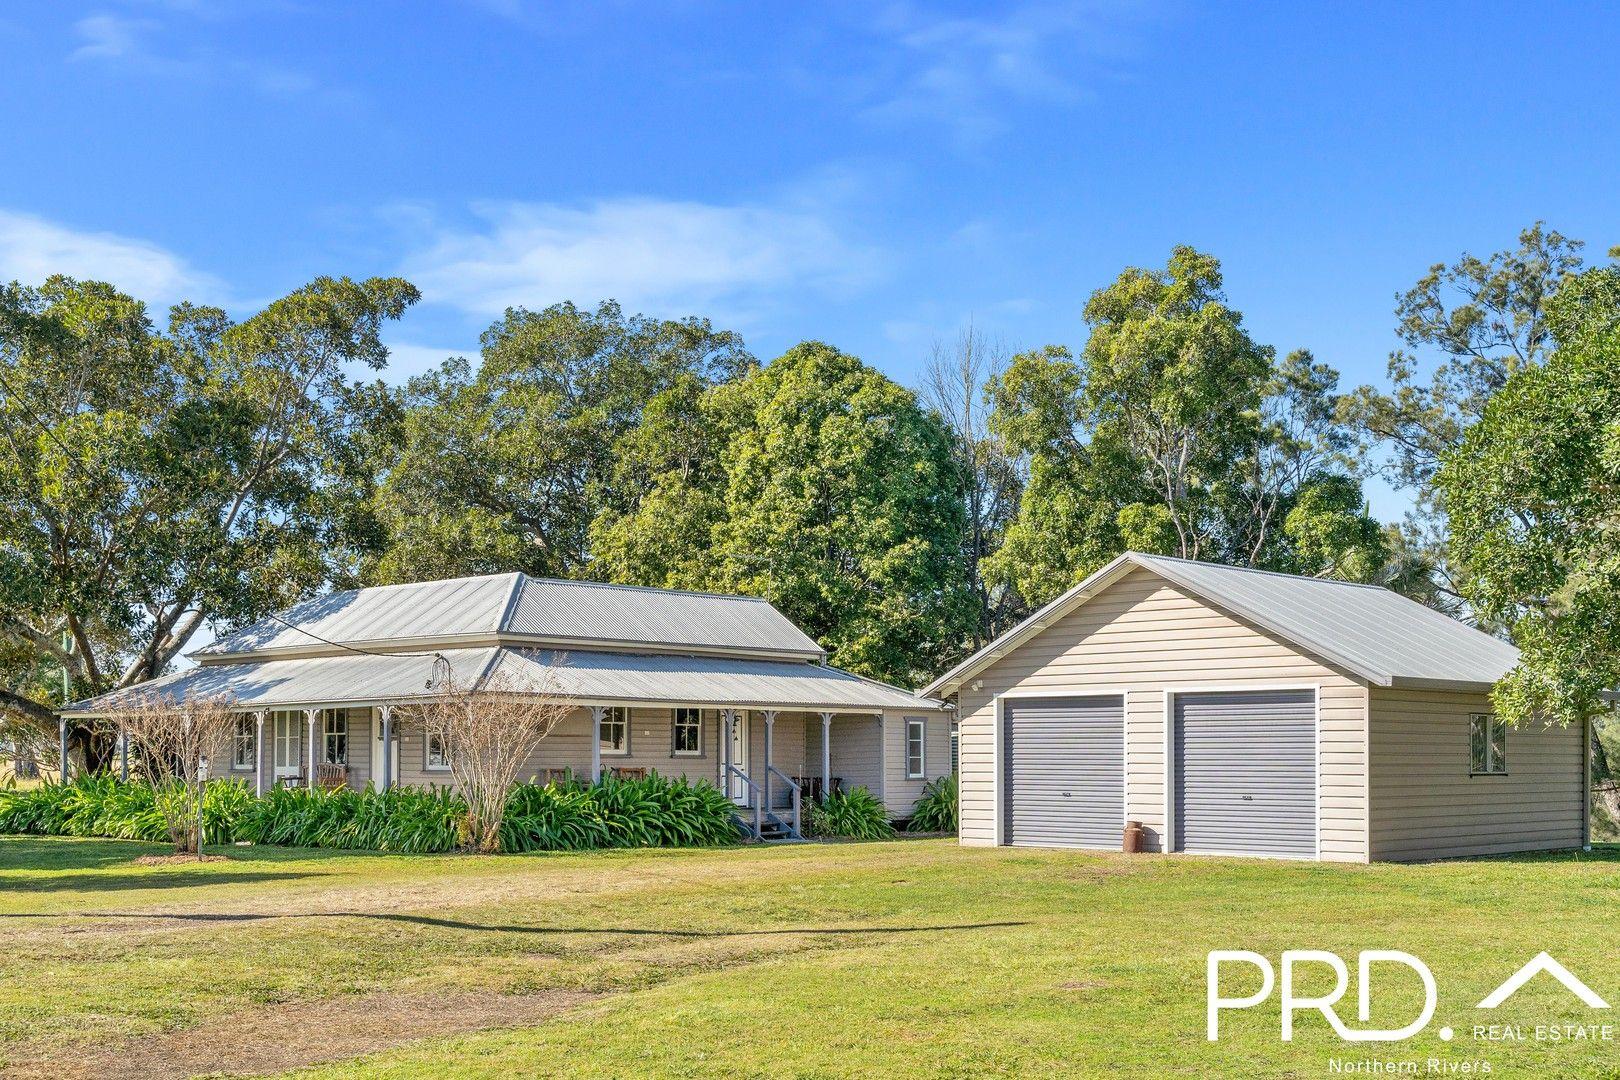 765 Tomki-Tatham Road, Tatham NSW 2471, Image 0